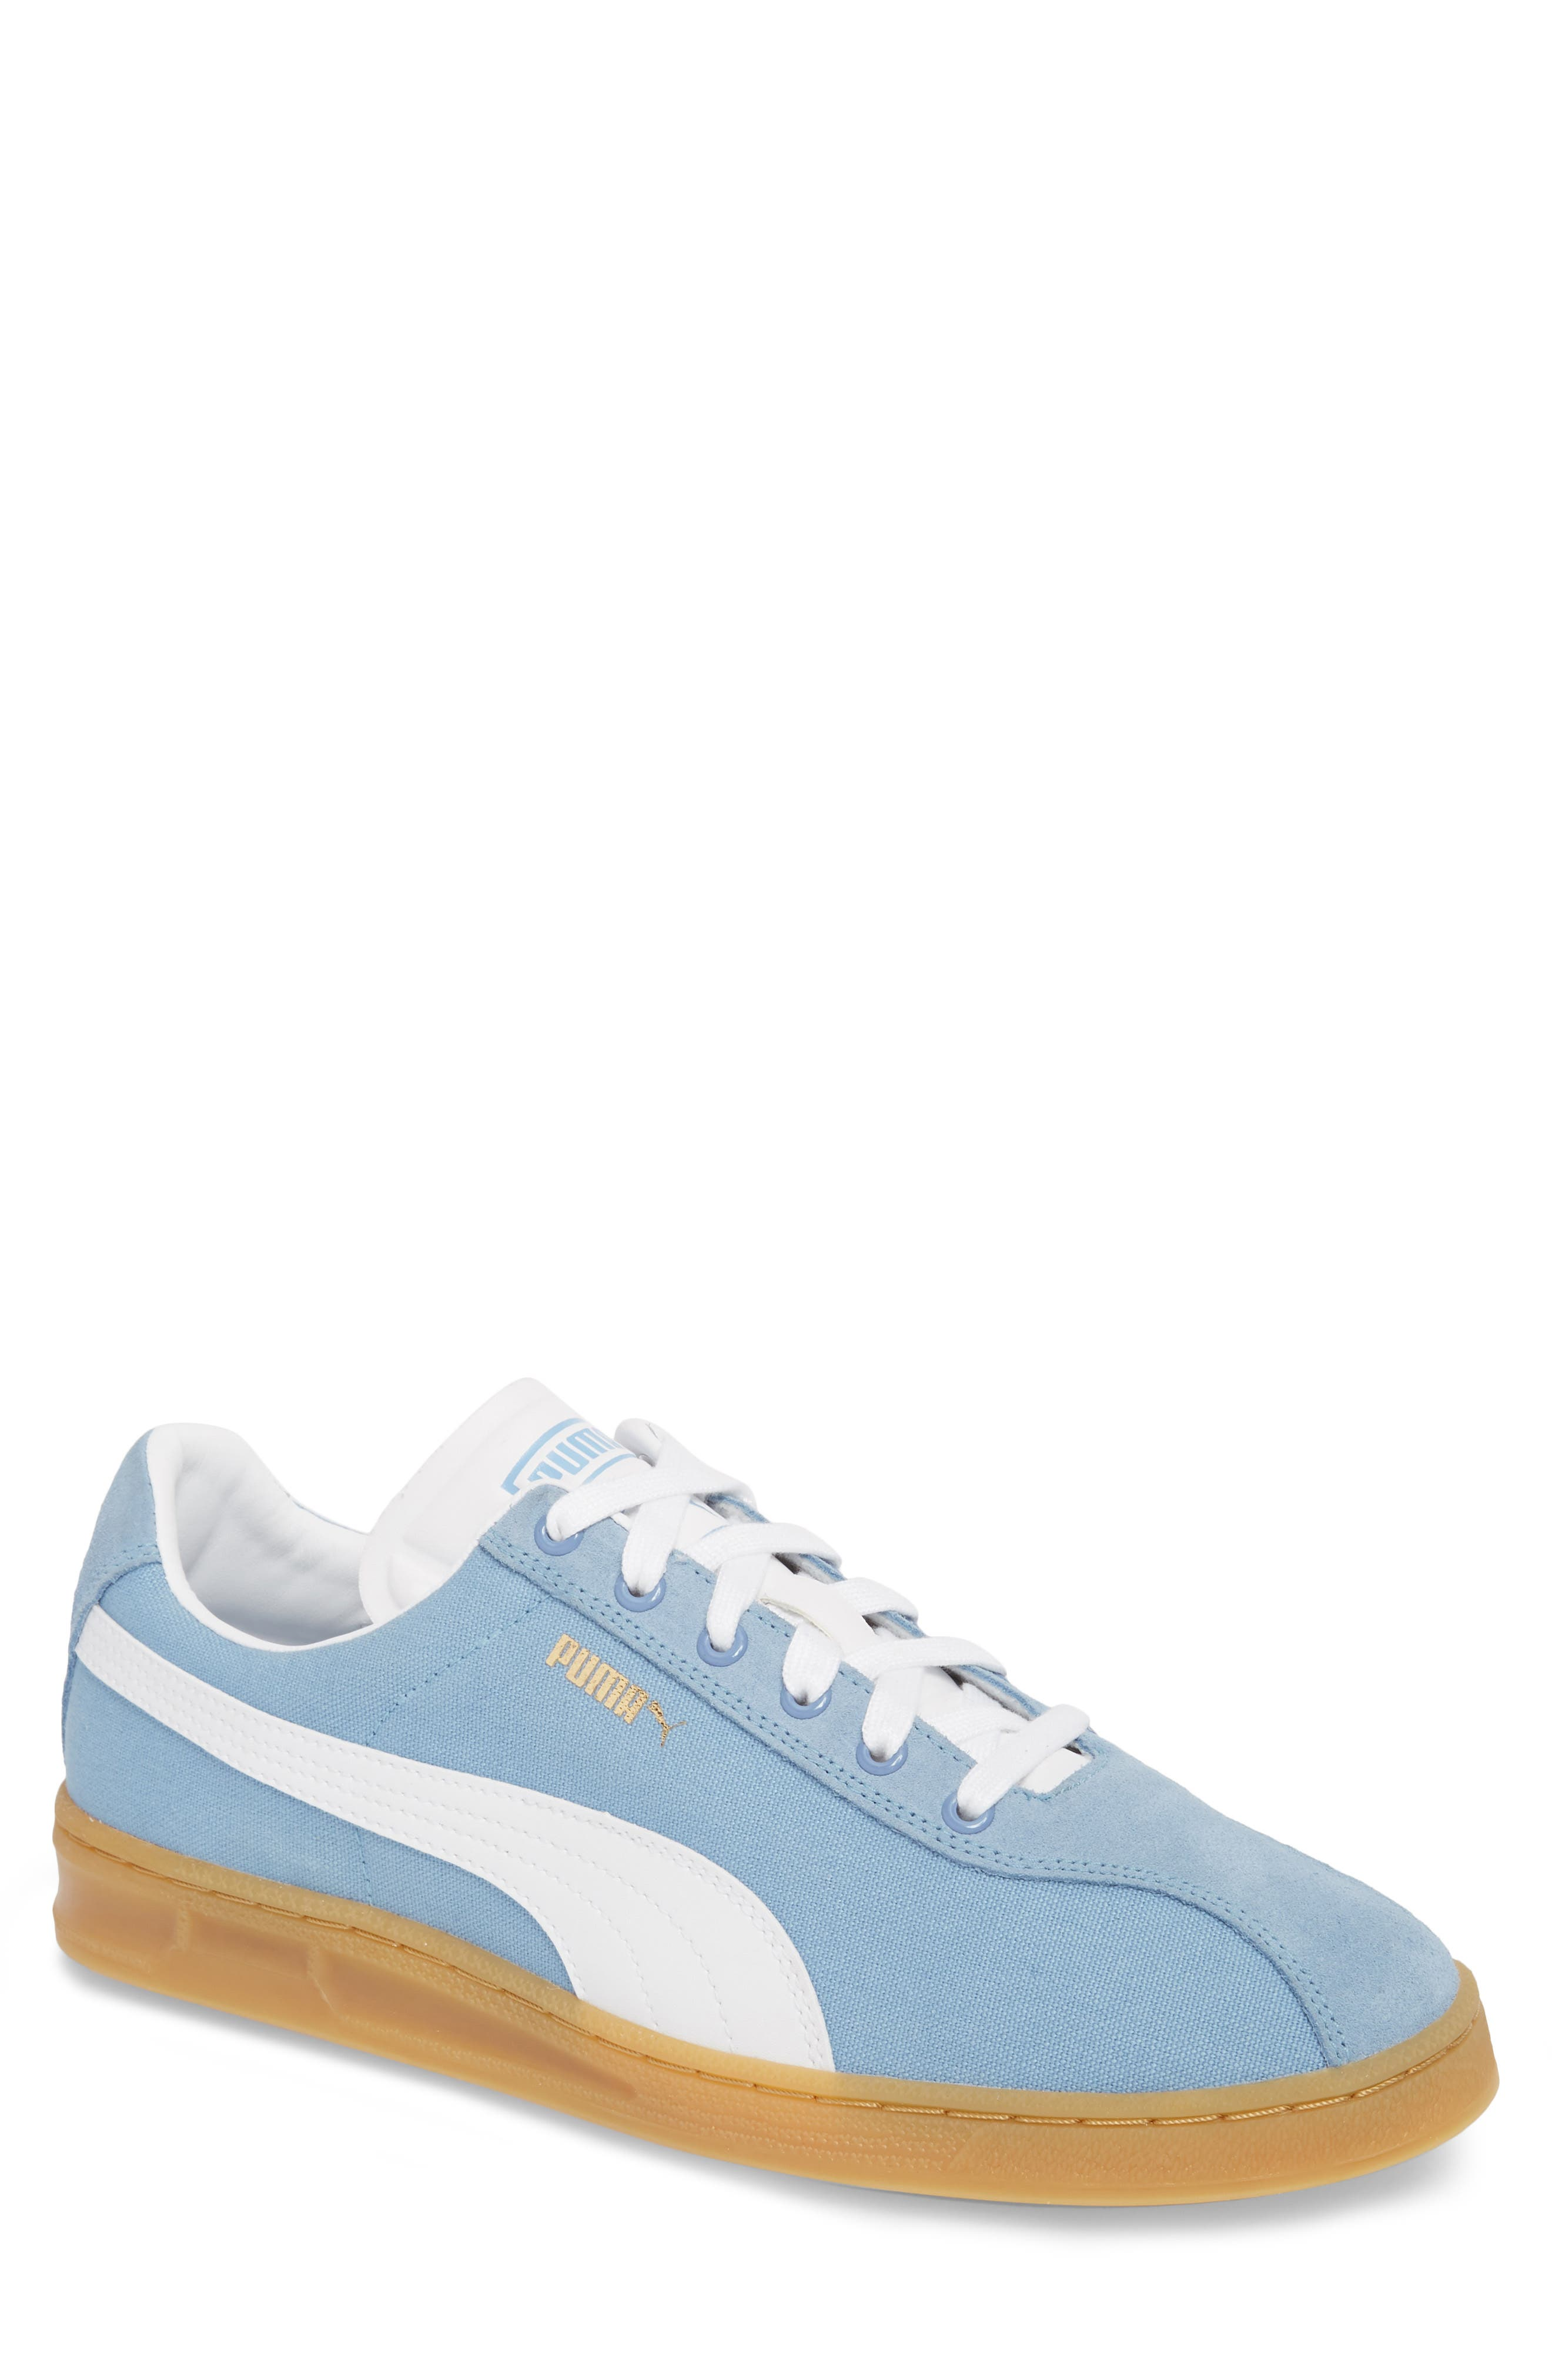 TK Indoor Summer Sneaker,                         Main,                         color, Allure/ White